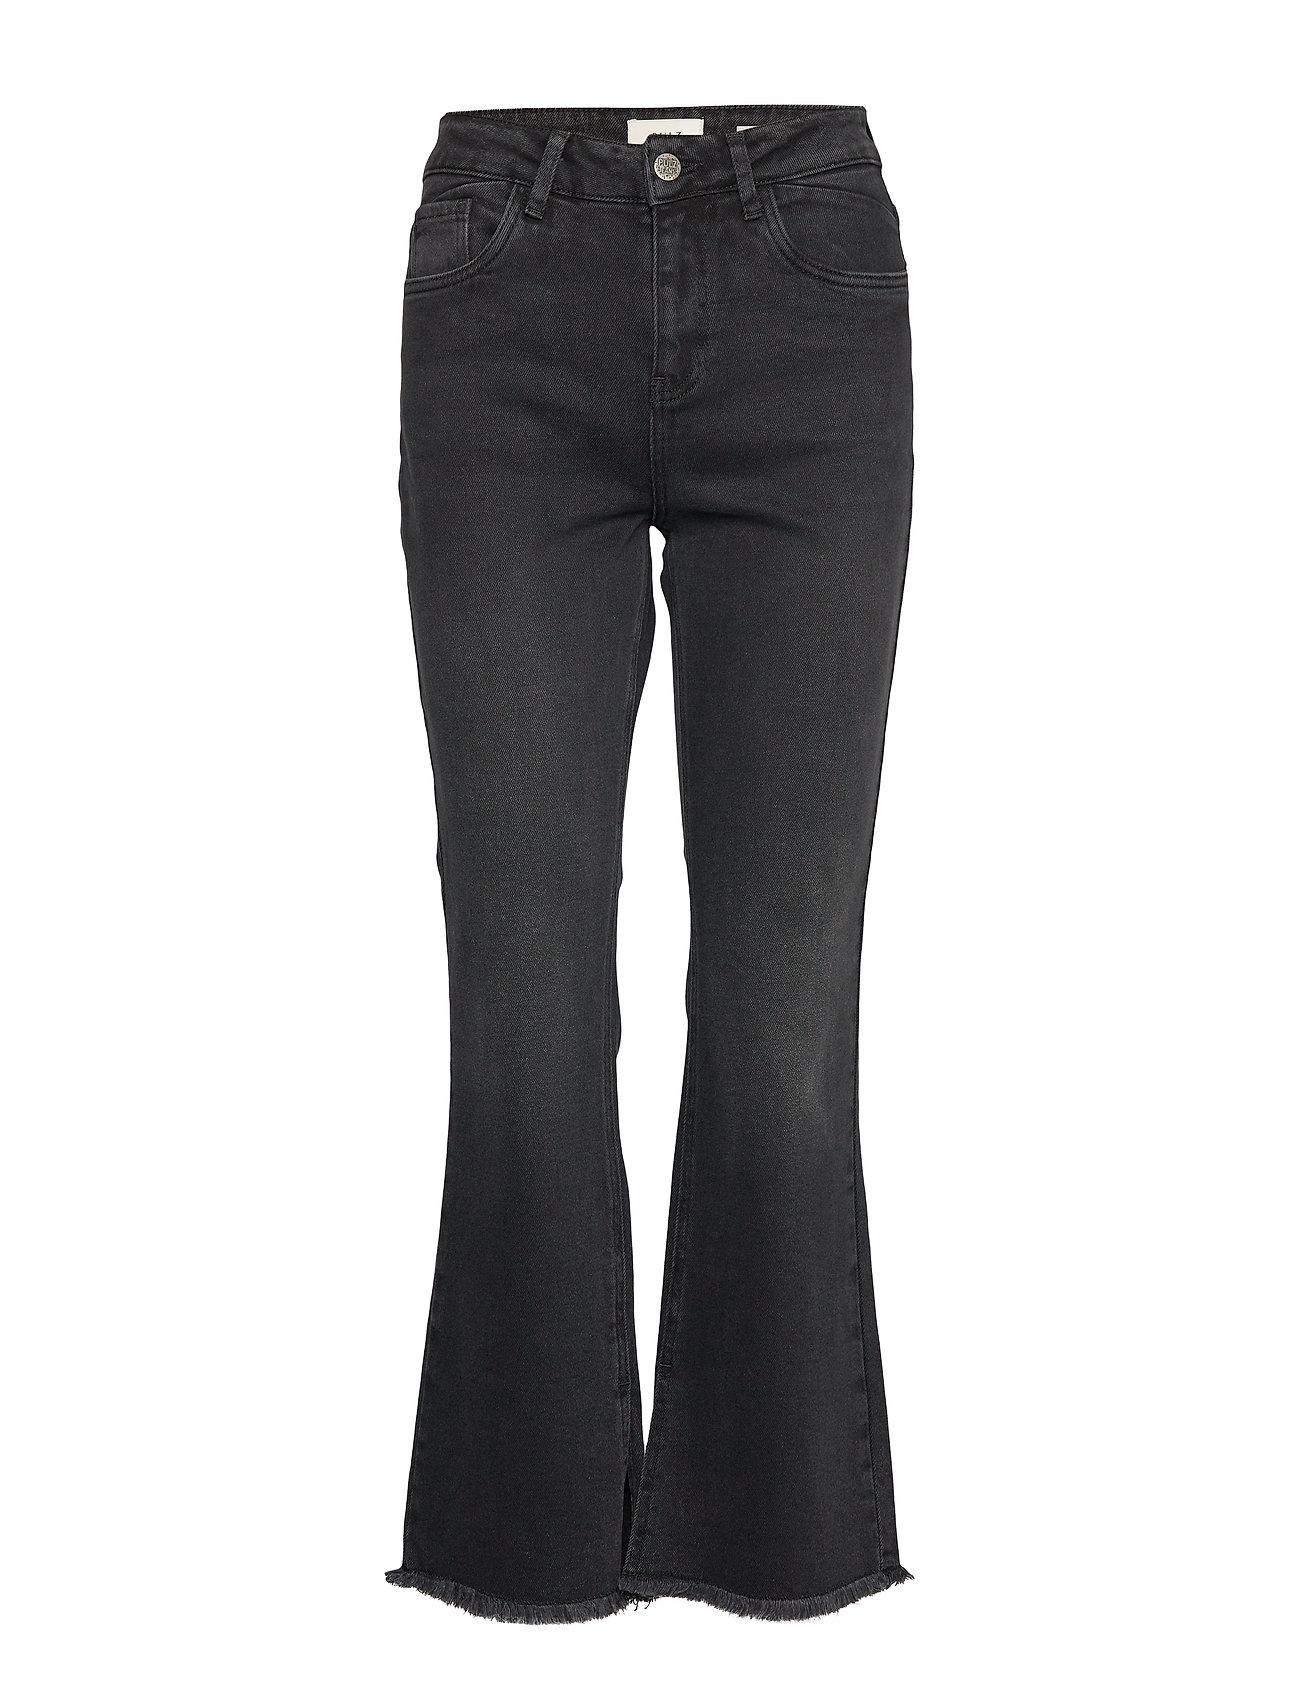 Pulz Jeans PZLIVA Ultra High Waist Flared - BLACK DENIM